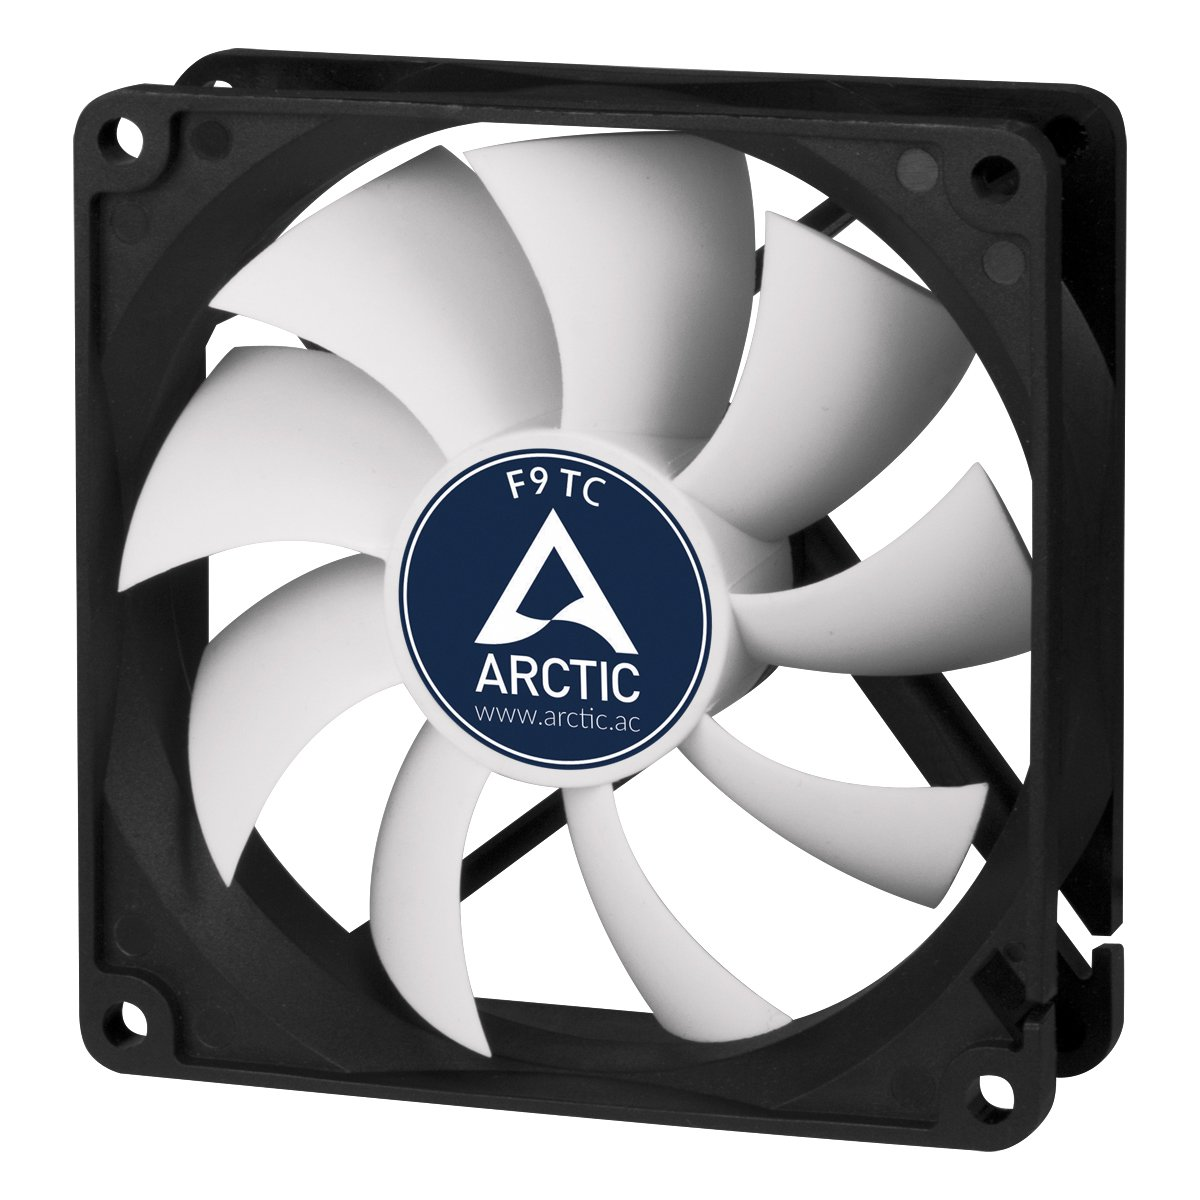 Arctic F9 Tc Temperature Controlled 92 Mm Case Fan Foxconn 12v Wire Diagram Standard Cooler Intelligent Heat Detector Regulates Rpm Push Or Pull